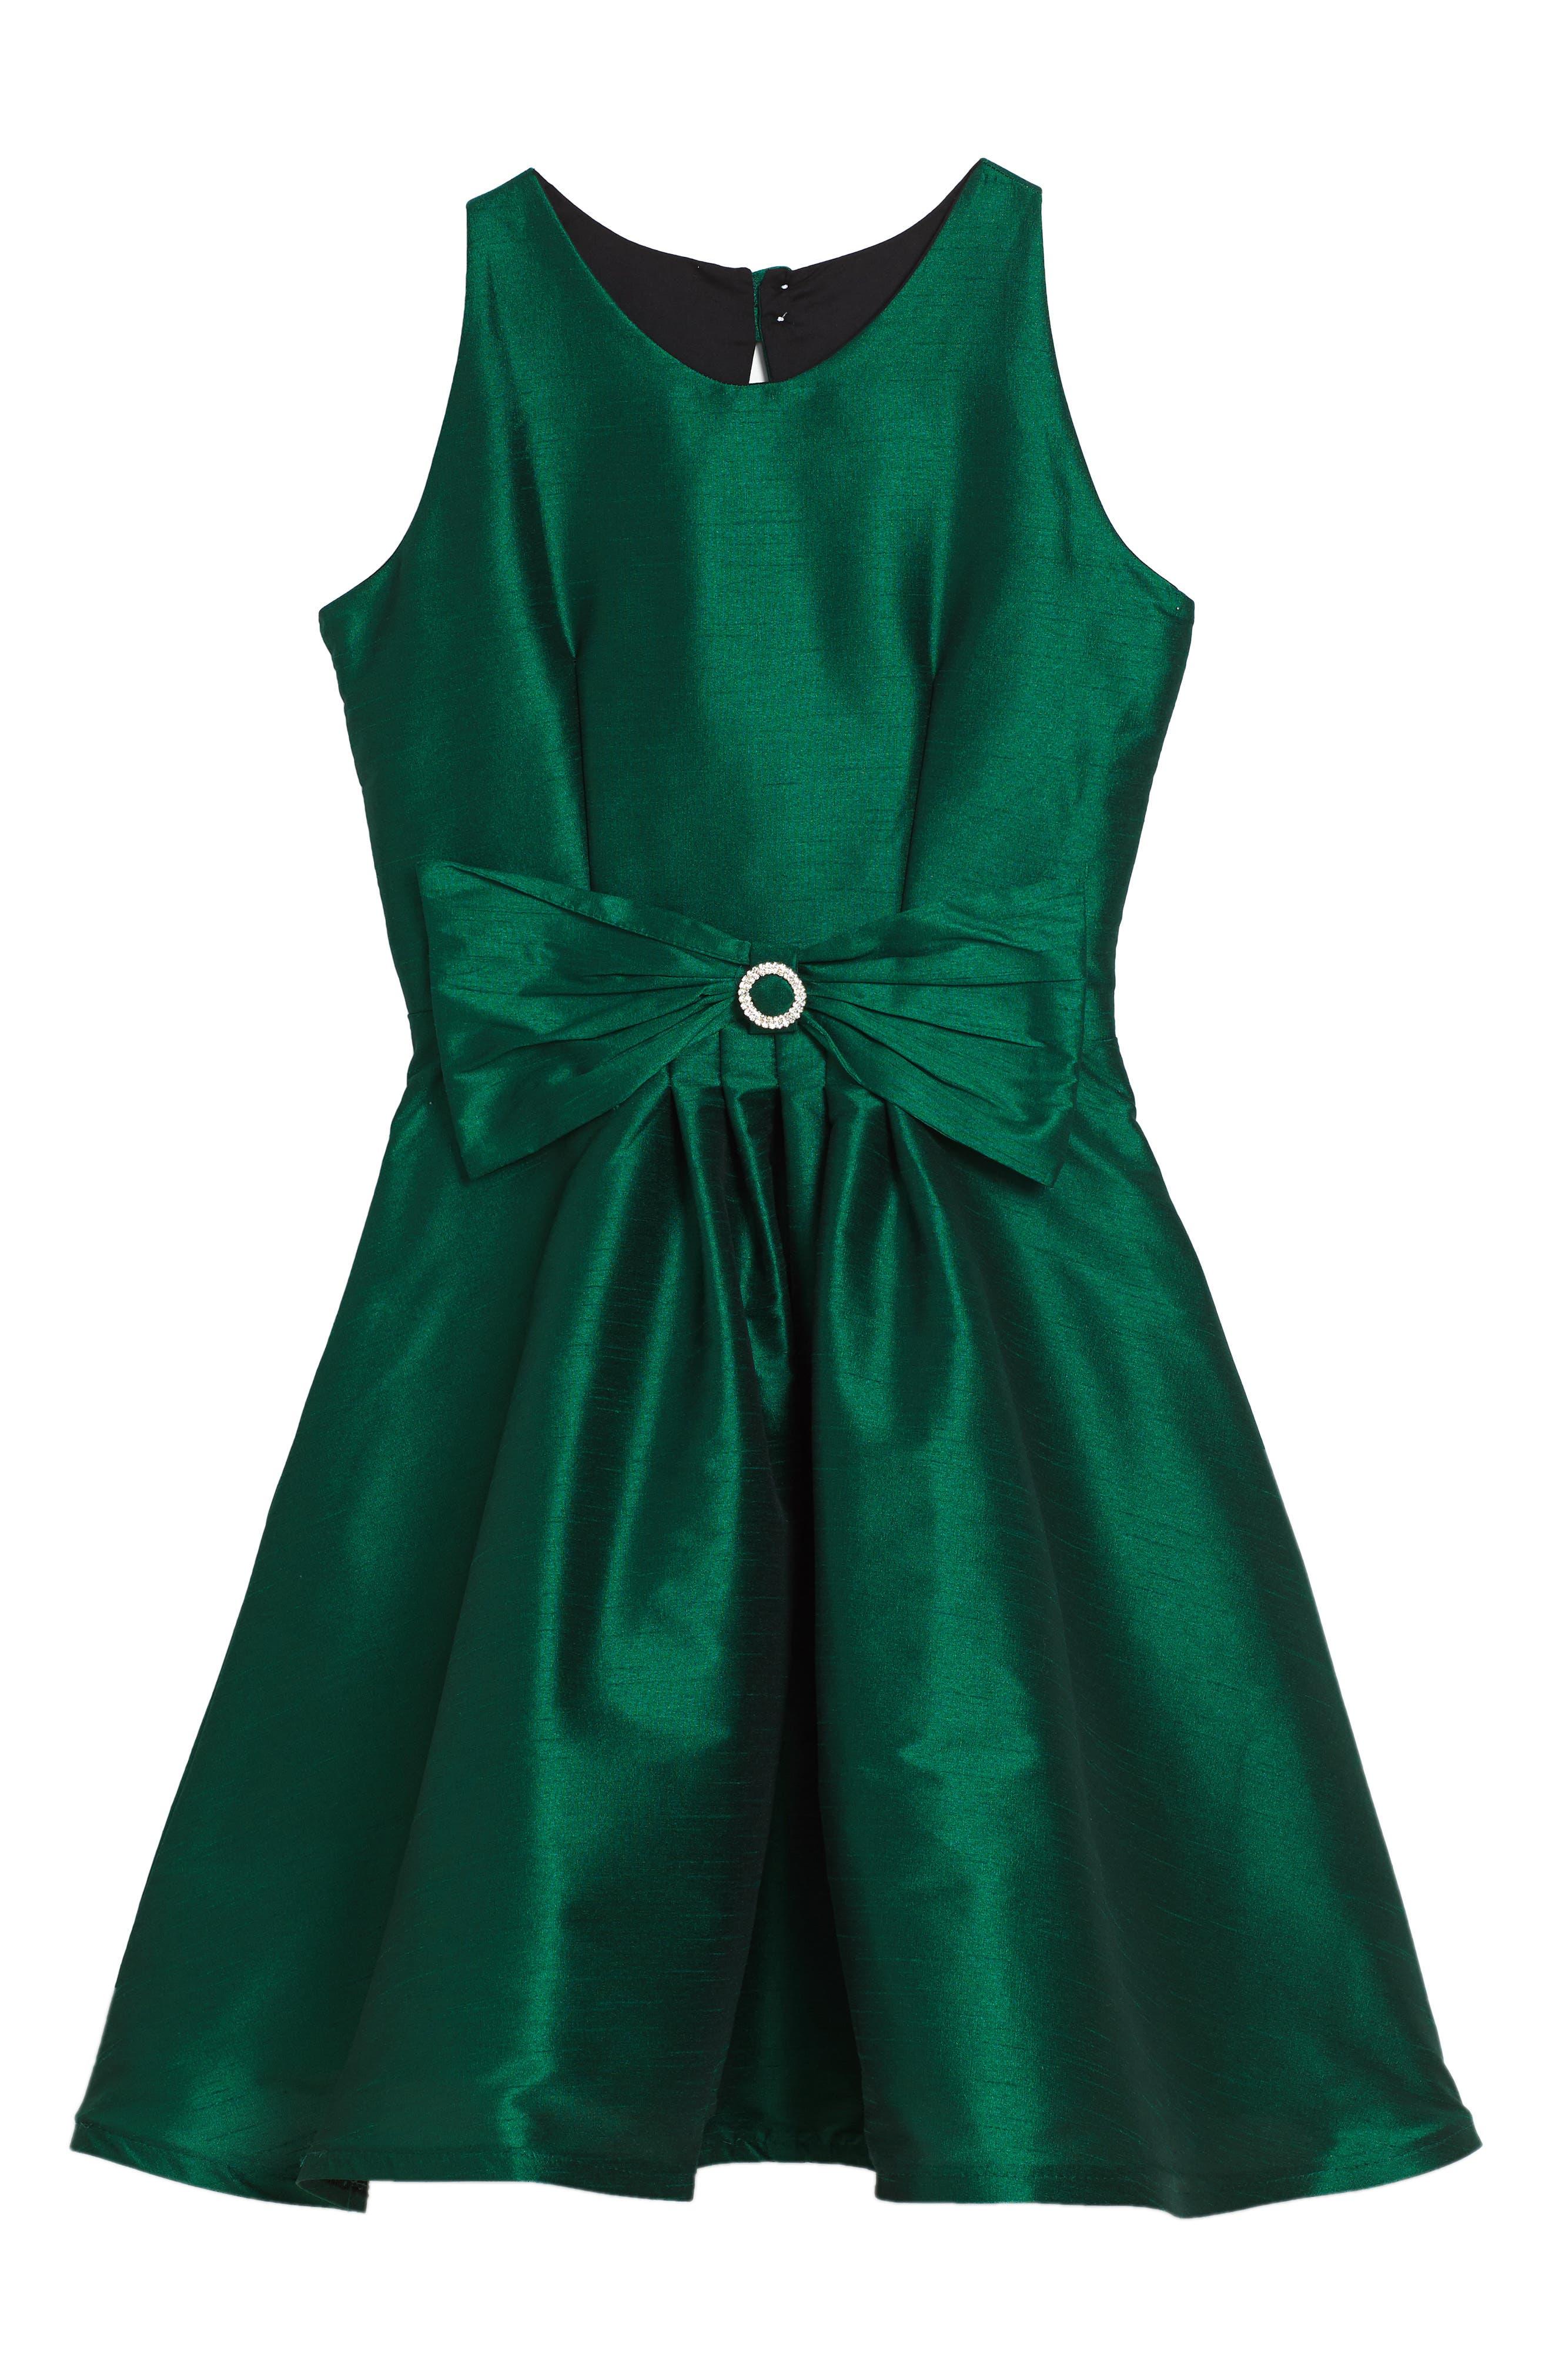 Alternate Image 1 Selected - Fiveloaves Twofish Holiday Beauty Sleeveless Dress (Big Girls)